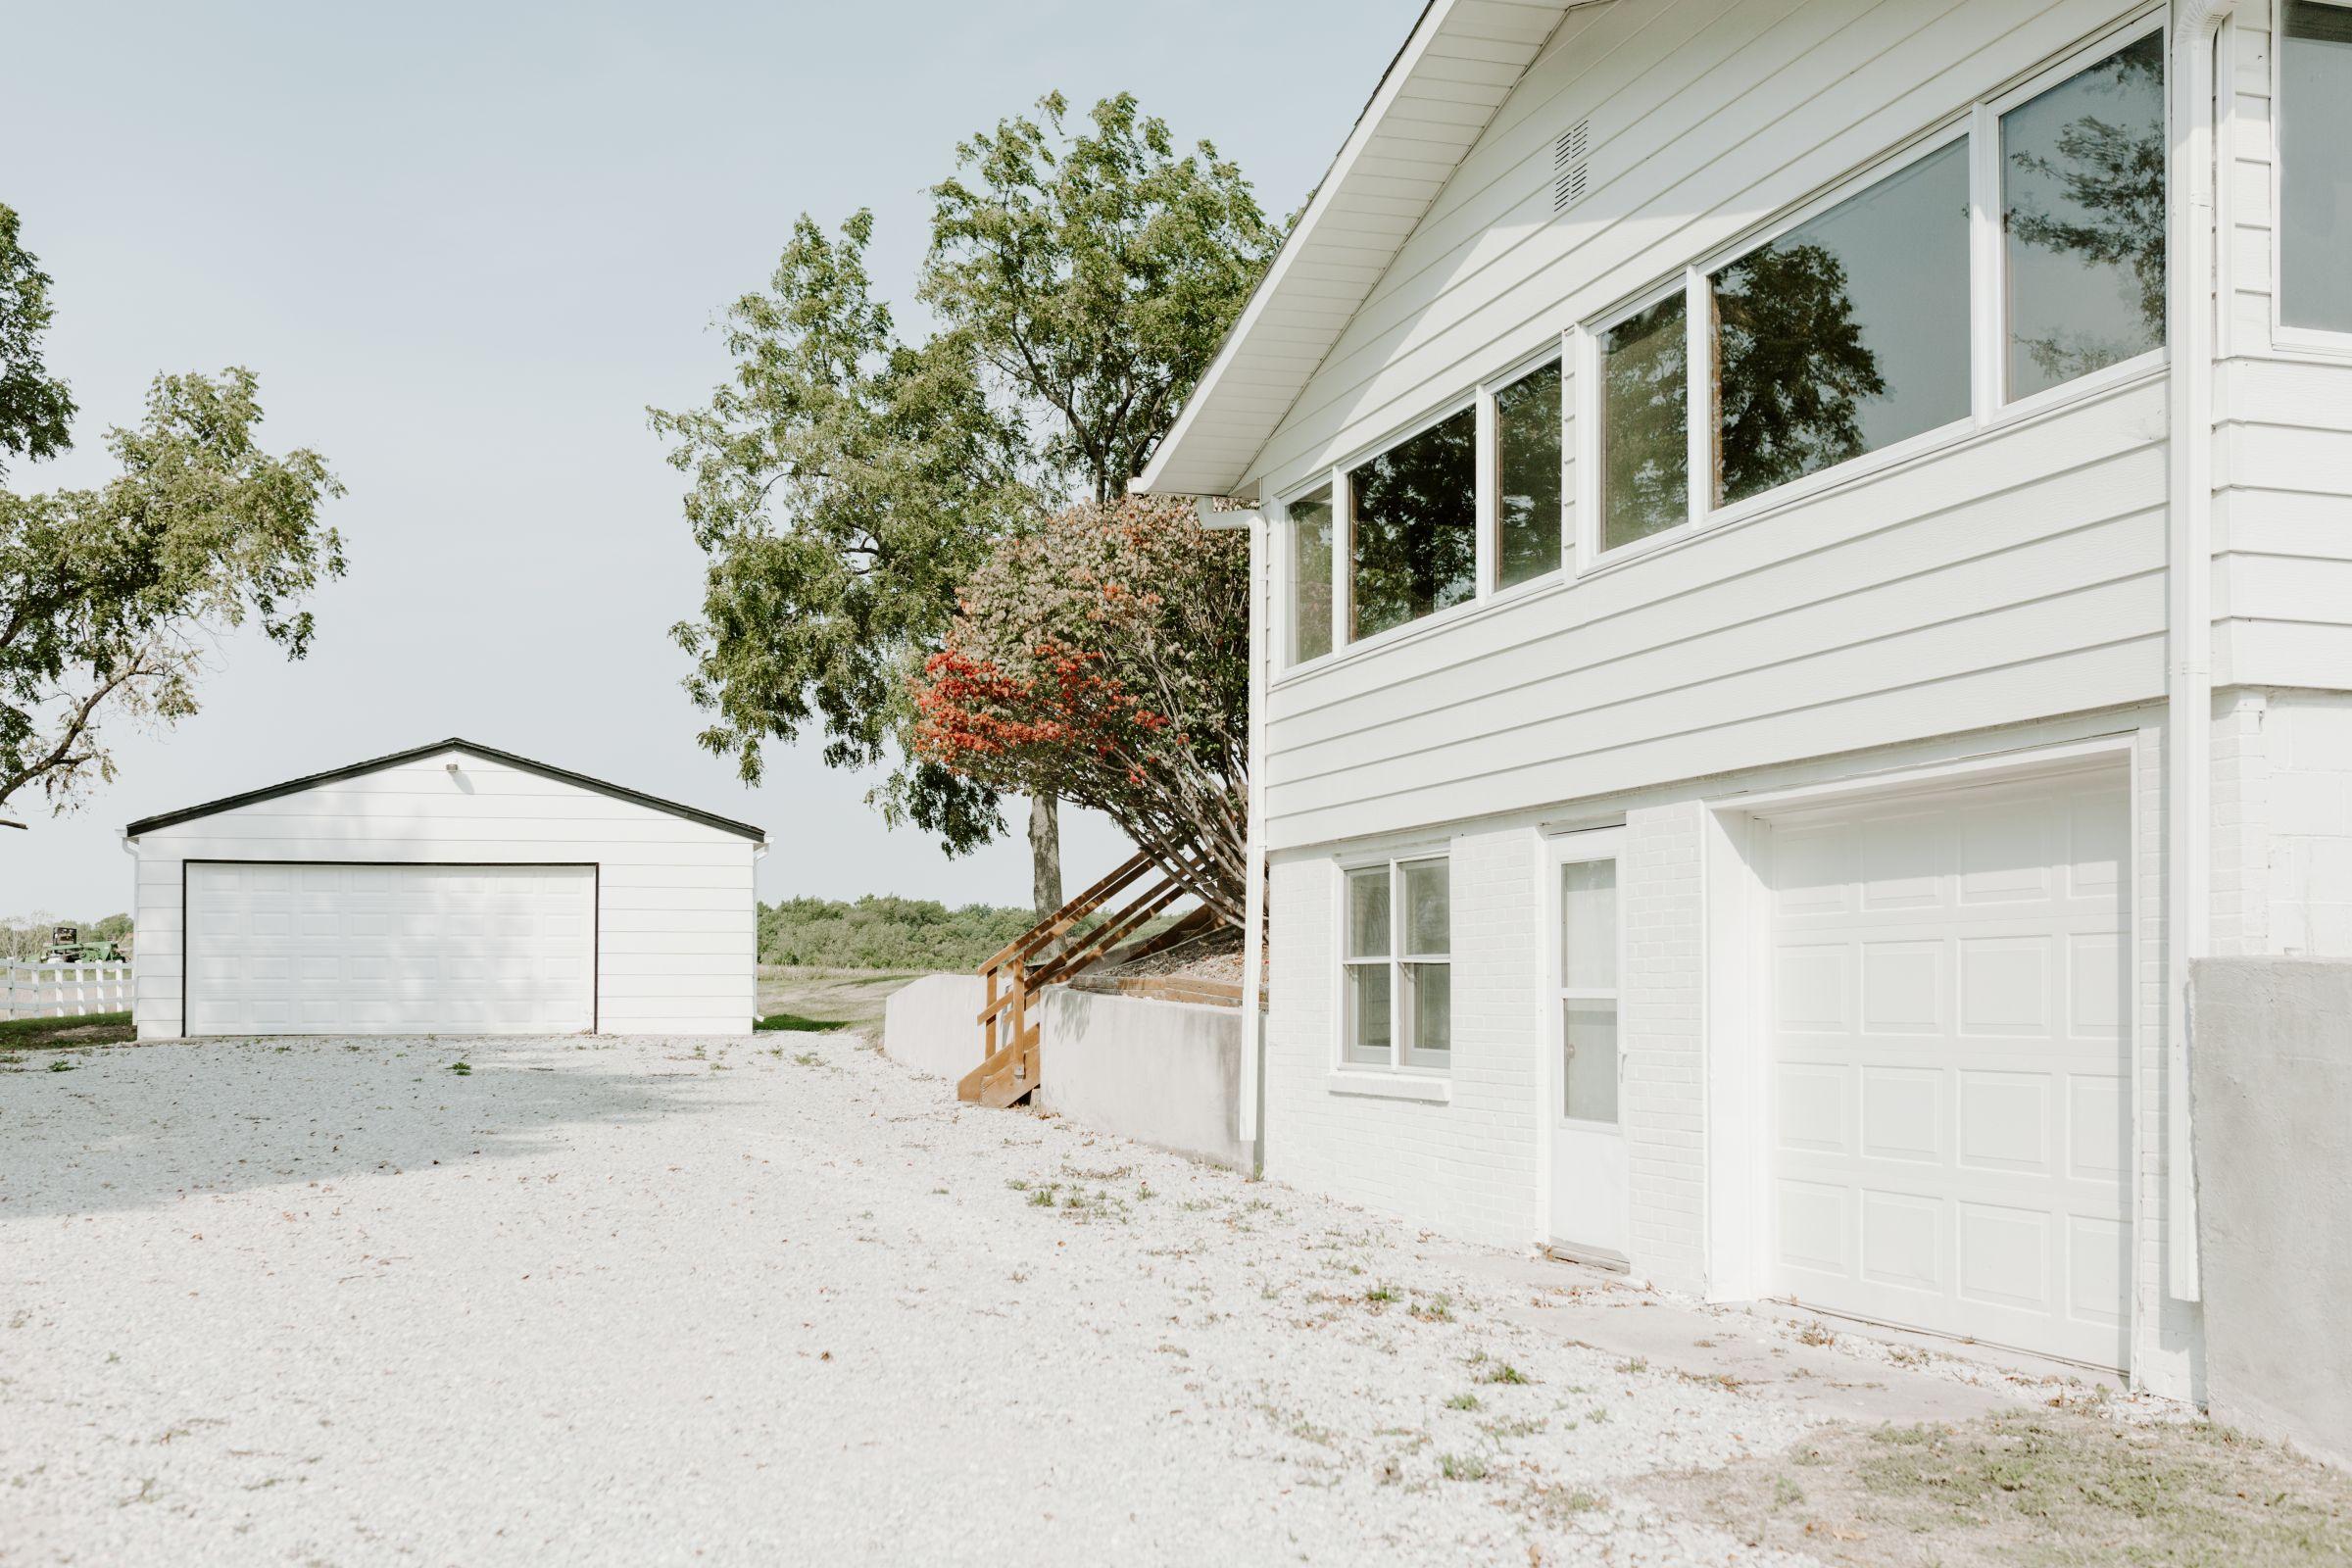 residential-warren-county-iowa-2-acres-listing-number-15743-1-2021-09-15-193731.jpg